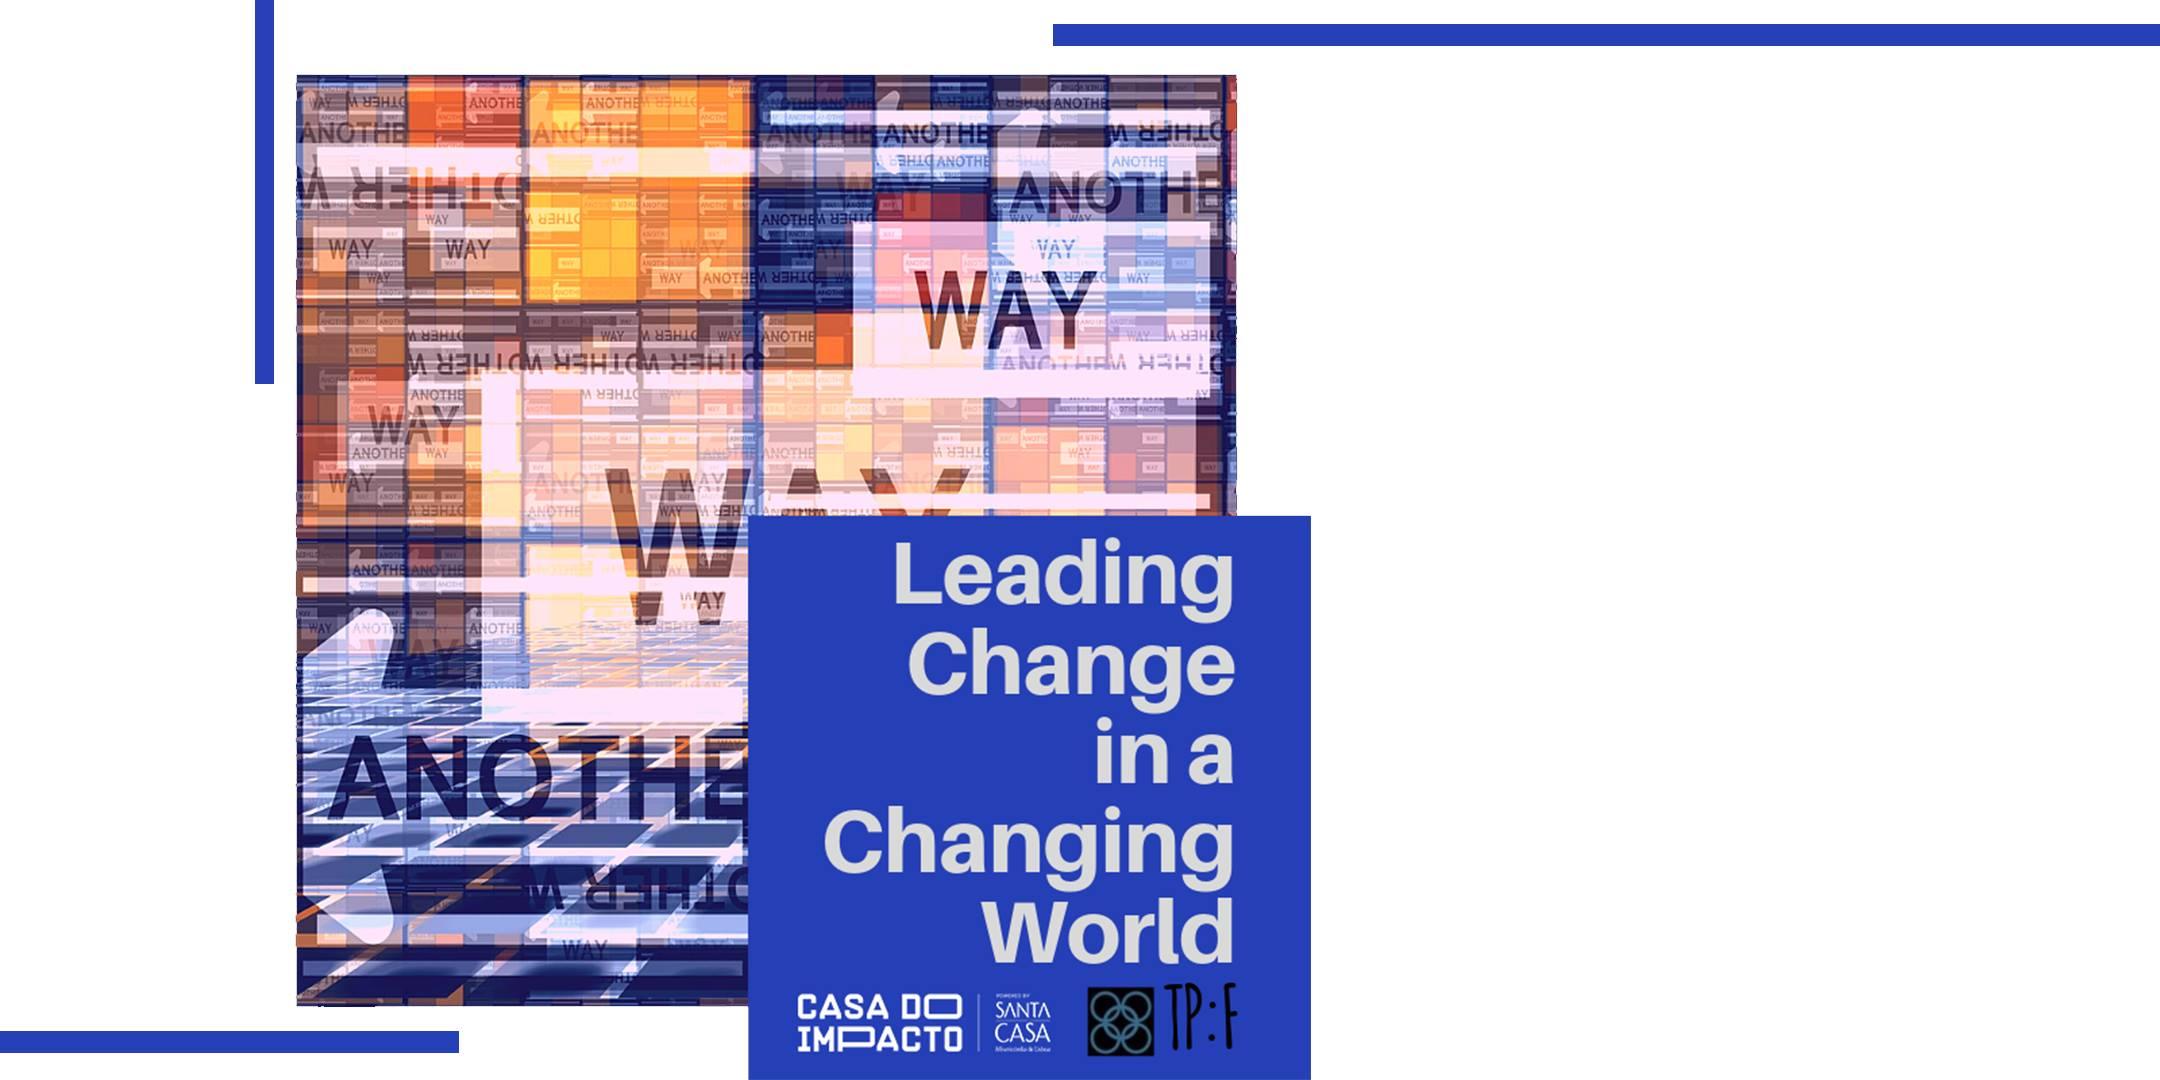 A Palhinha de massa comestivel - Leading change in a changinf world.jpg